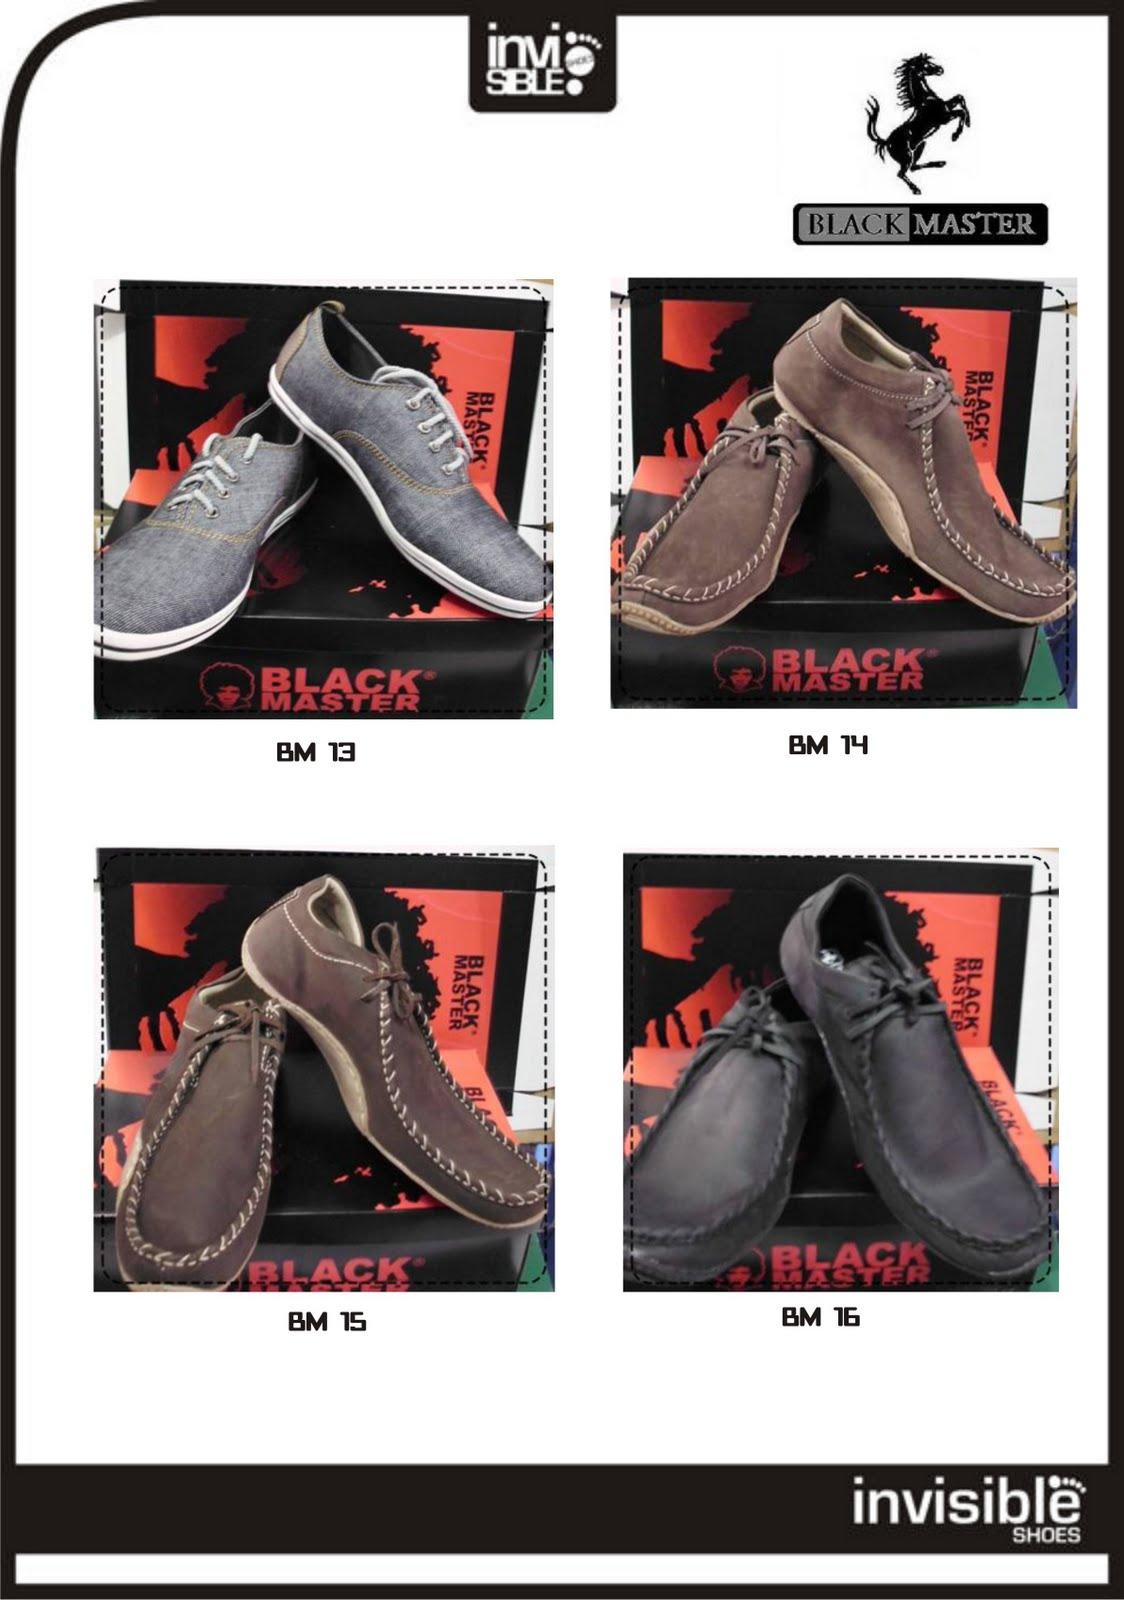 toko sepatu online: SEPATU BLACK MASTER original